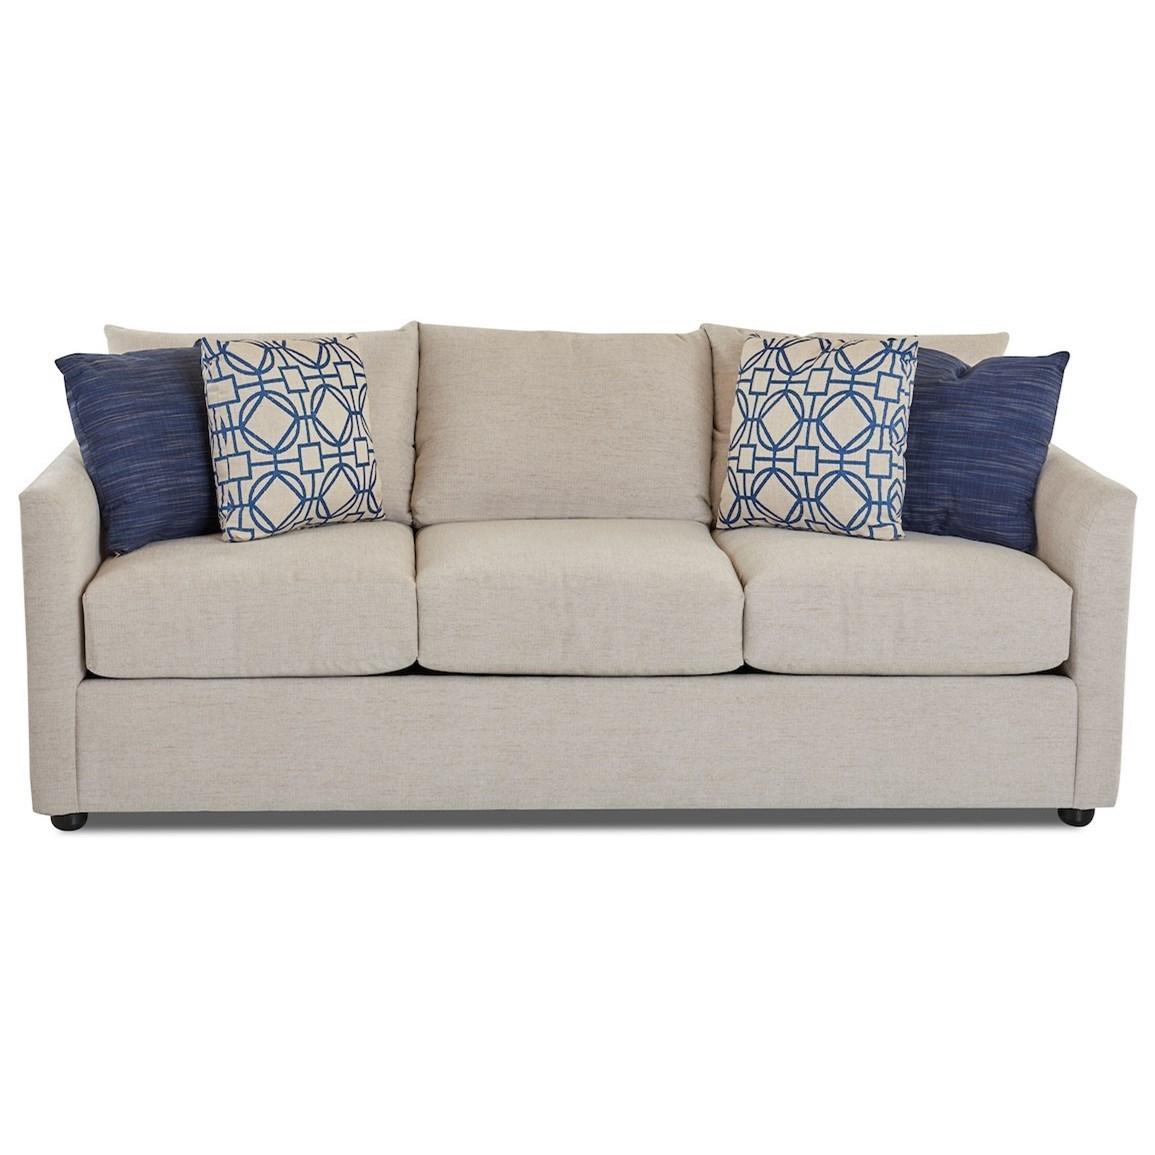 Atlanta Sleeper Sofa w/ Dreamquest Mattress by Klaussner at Northeast Factory Direct